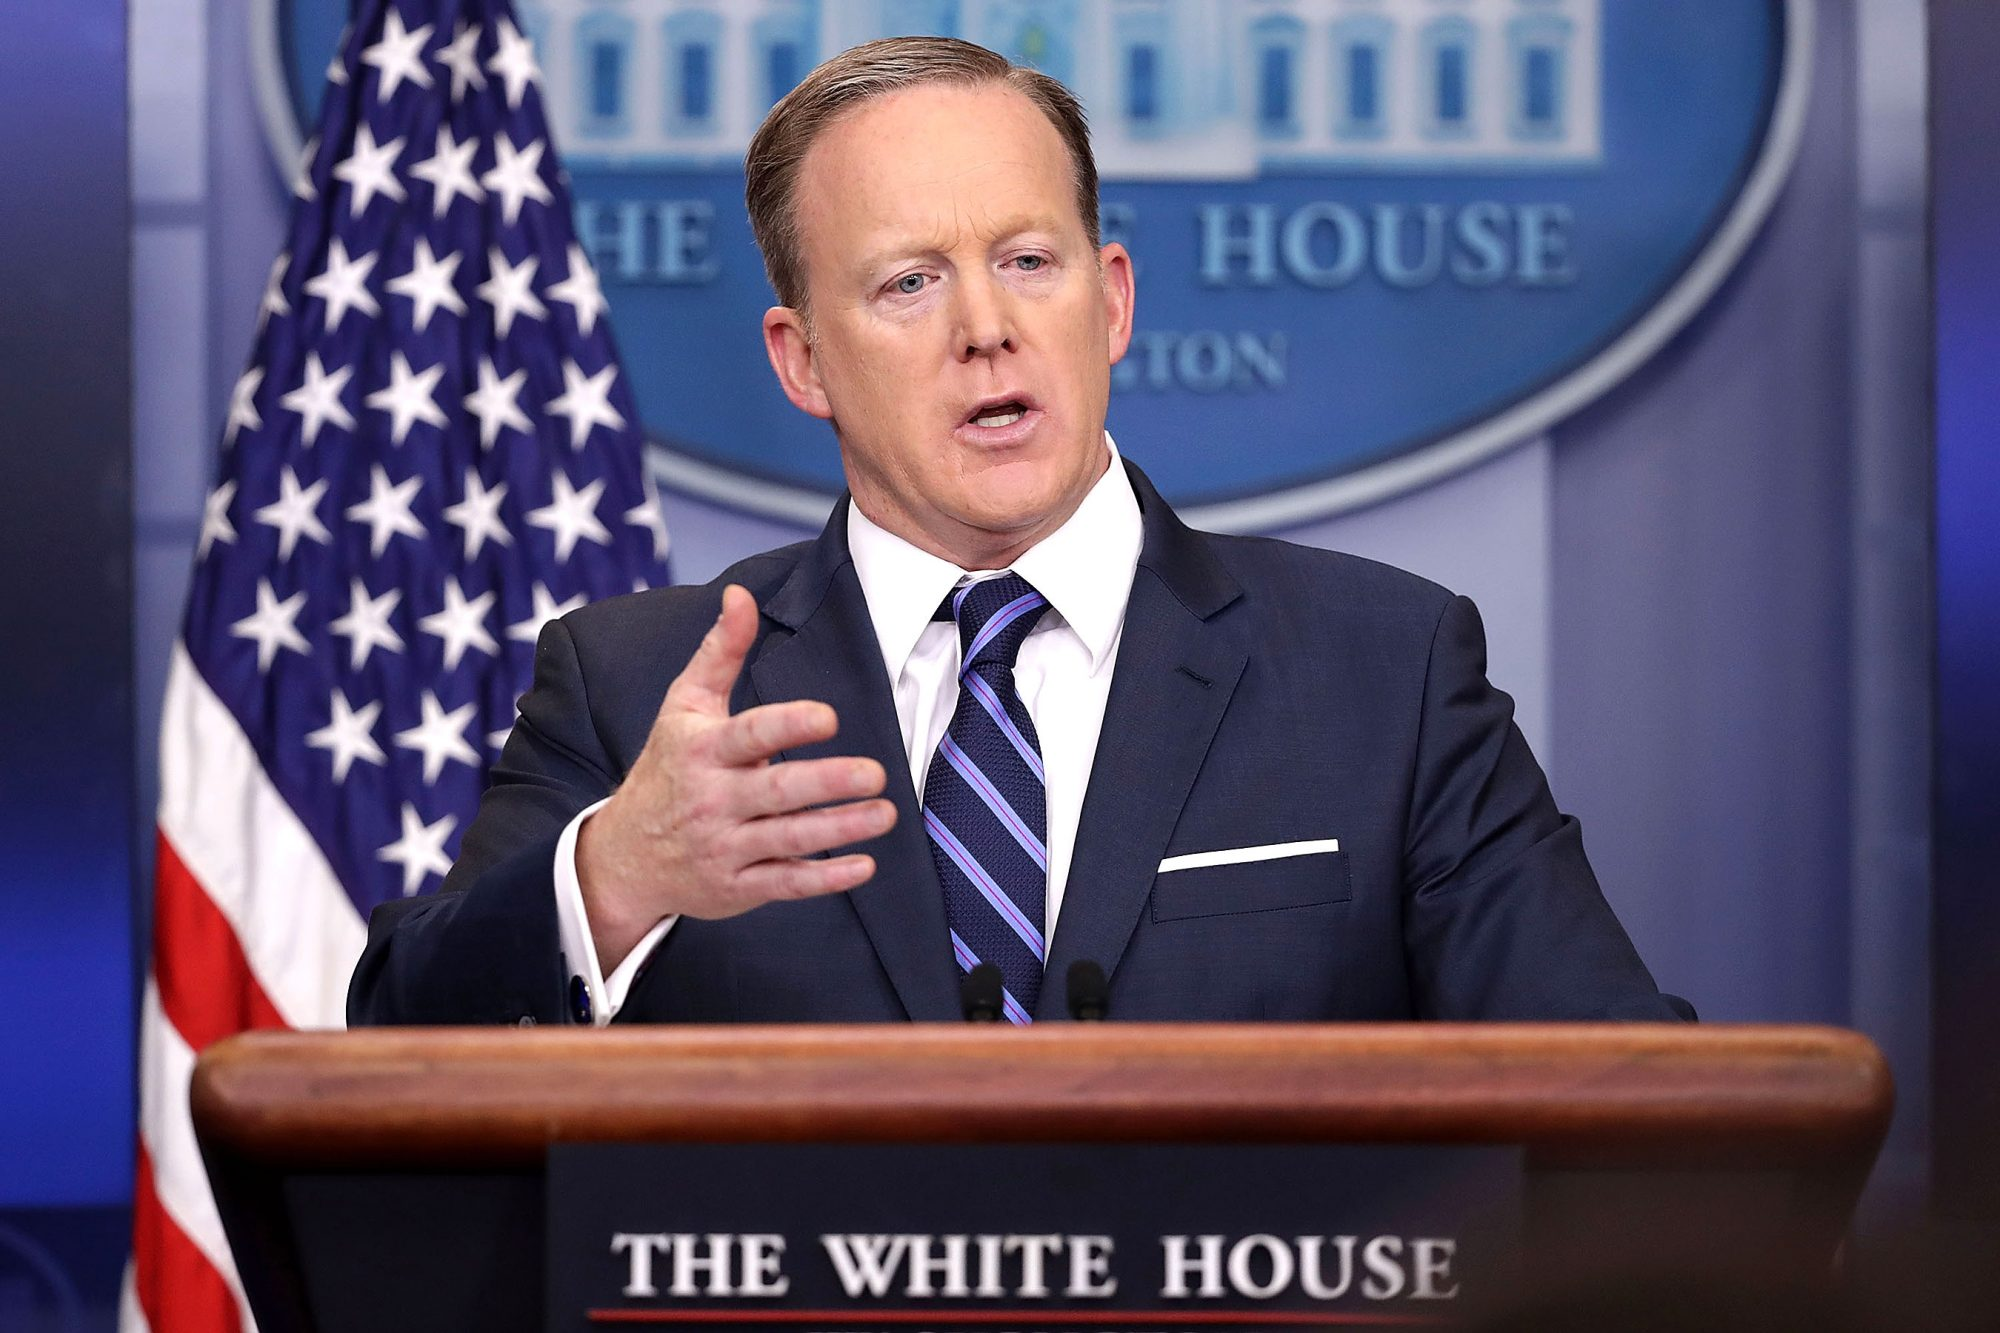 White House Press Secretary Sean Spicer Holds Daily Press Briefing In White House Briefing Room